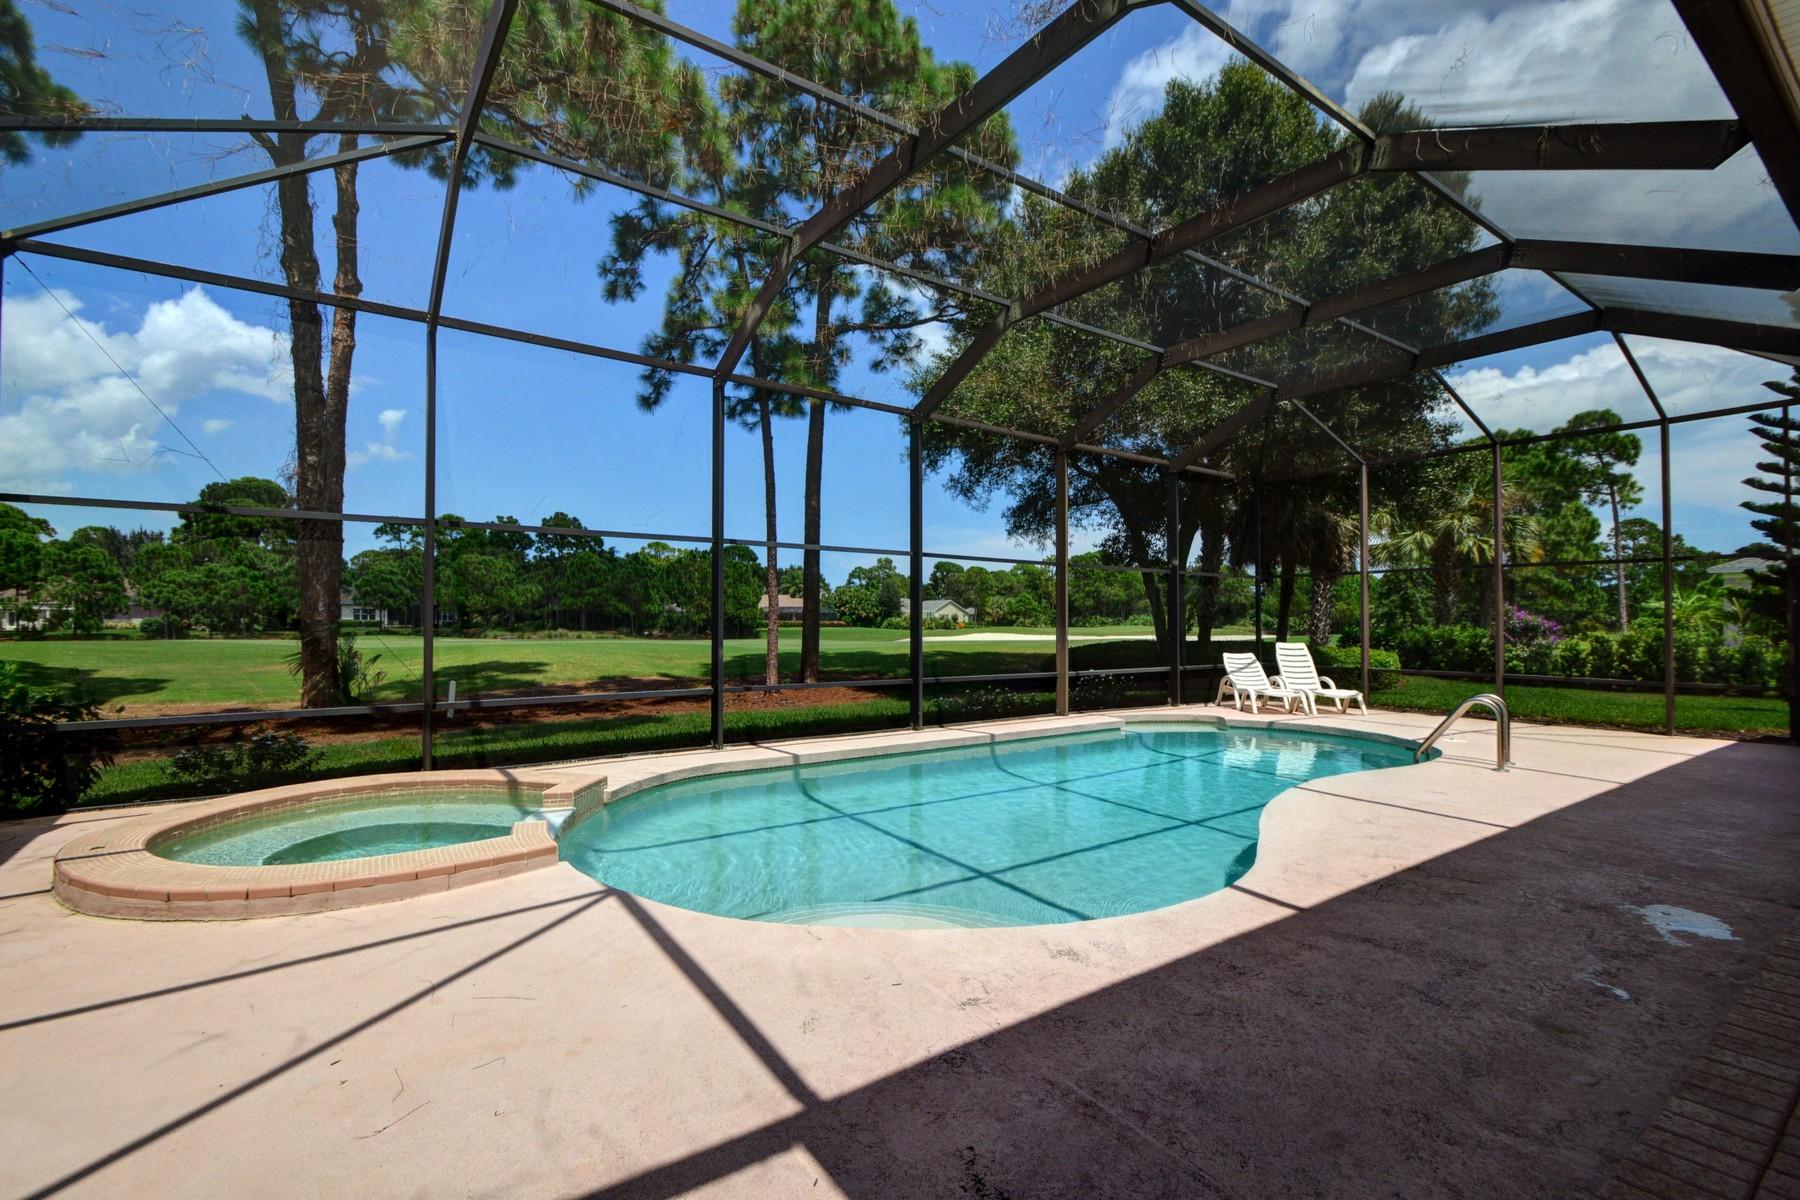 Villa per Vendita alle ore Spectacular home on golf course with lake views 960 Wood Haven Lane SW Vero Beach, Florida 32962 Stati Uniti